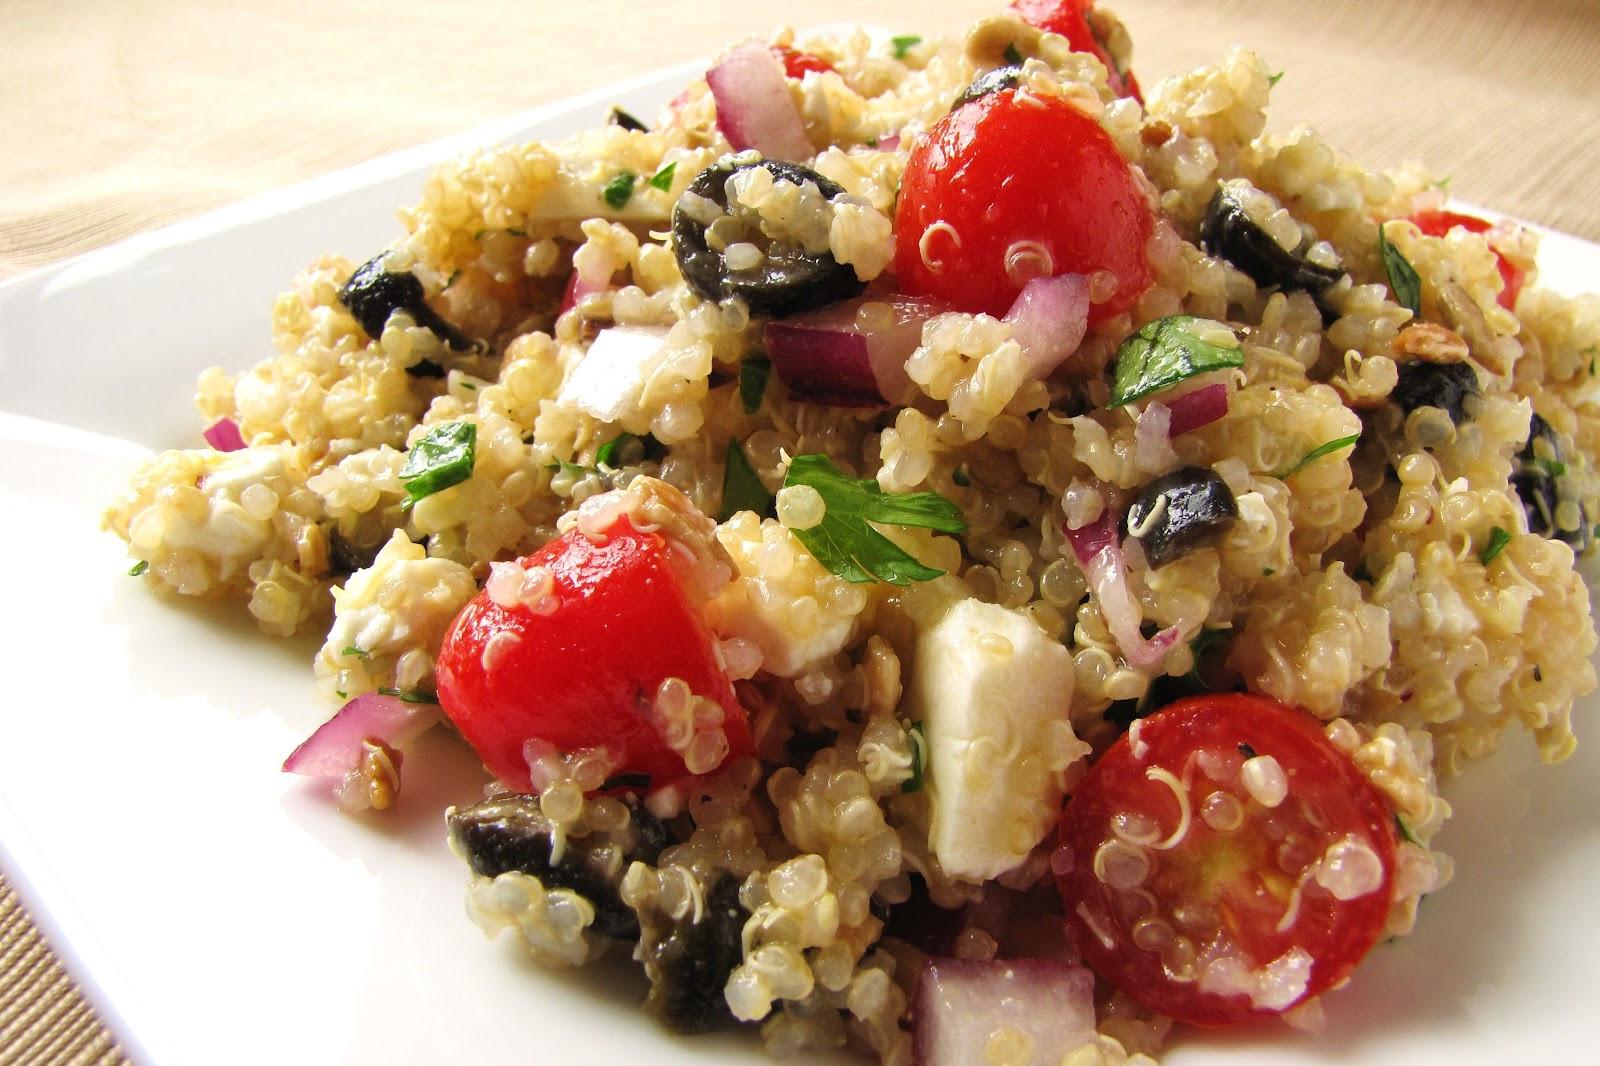 Quinoa Salad Feta  Summertime Lemon Feta Quinoa Salad Delicious as it Looks